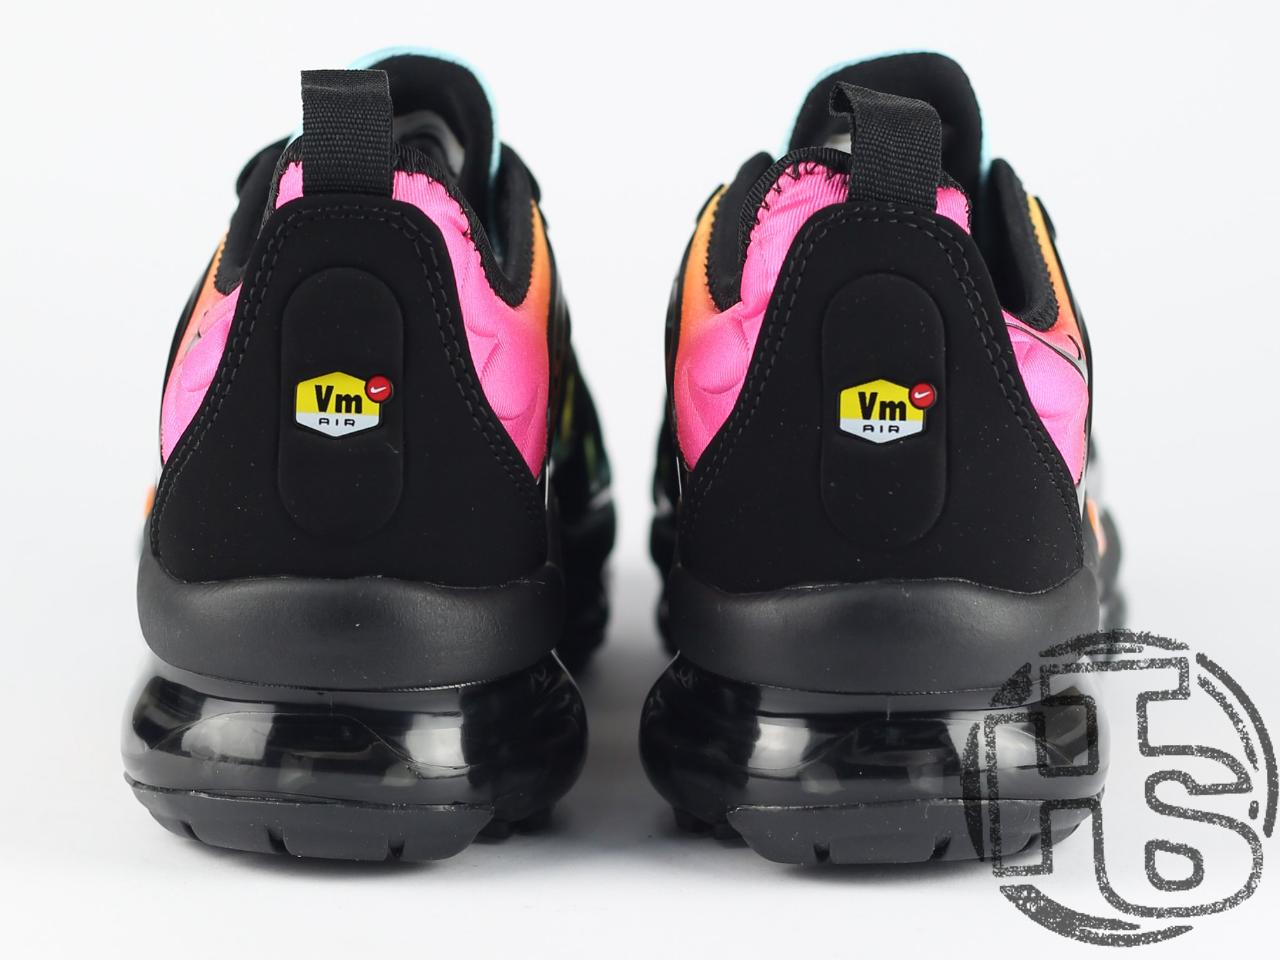 hot sale online f5dca e9065 Мужские кроссовки Nike Air VaporMax Plus Sunset Multicolor A04550-002, цена  1 549 грн., купить в Львове — Prom.ua (ID 659086072)